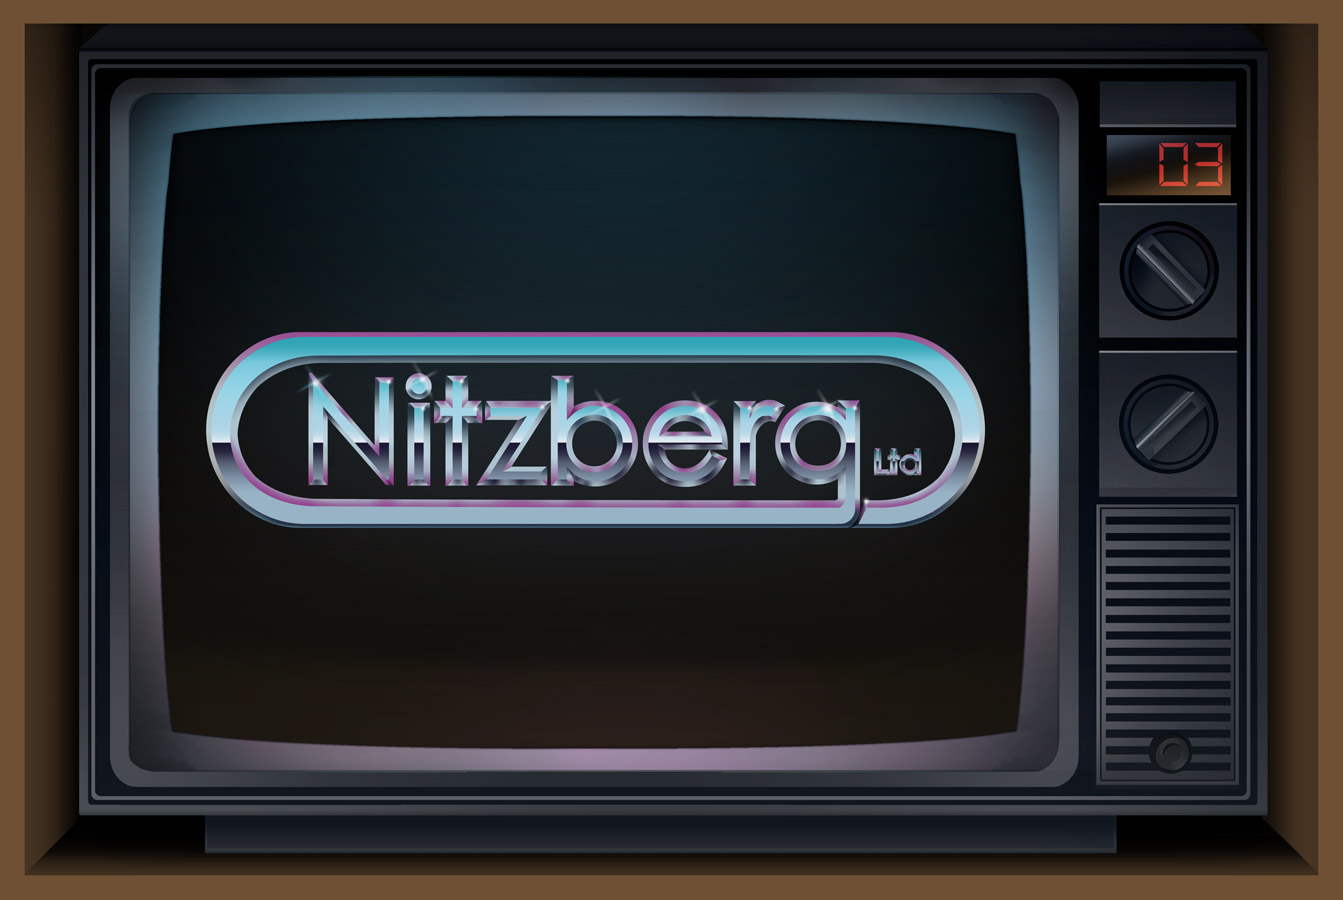 Nitzberg Ltd. Retro Chrome Logo | Photoshop